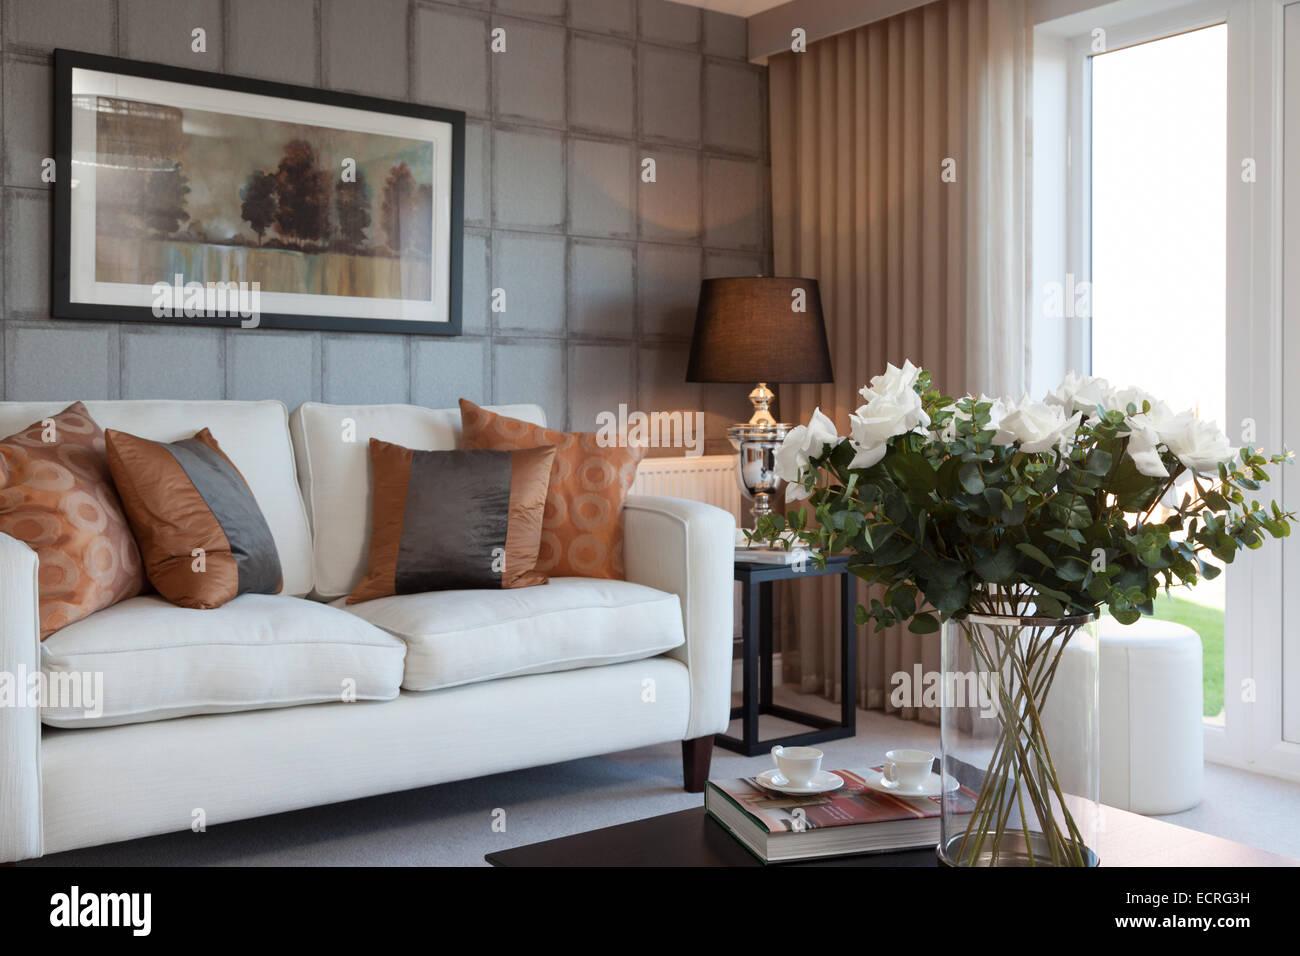 contemporary furnishings stock photo royalty free image   - contemporary furnishings